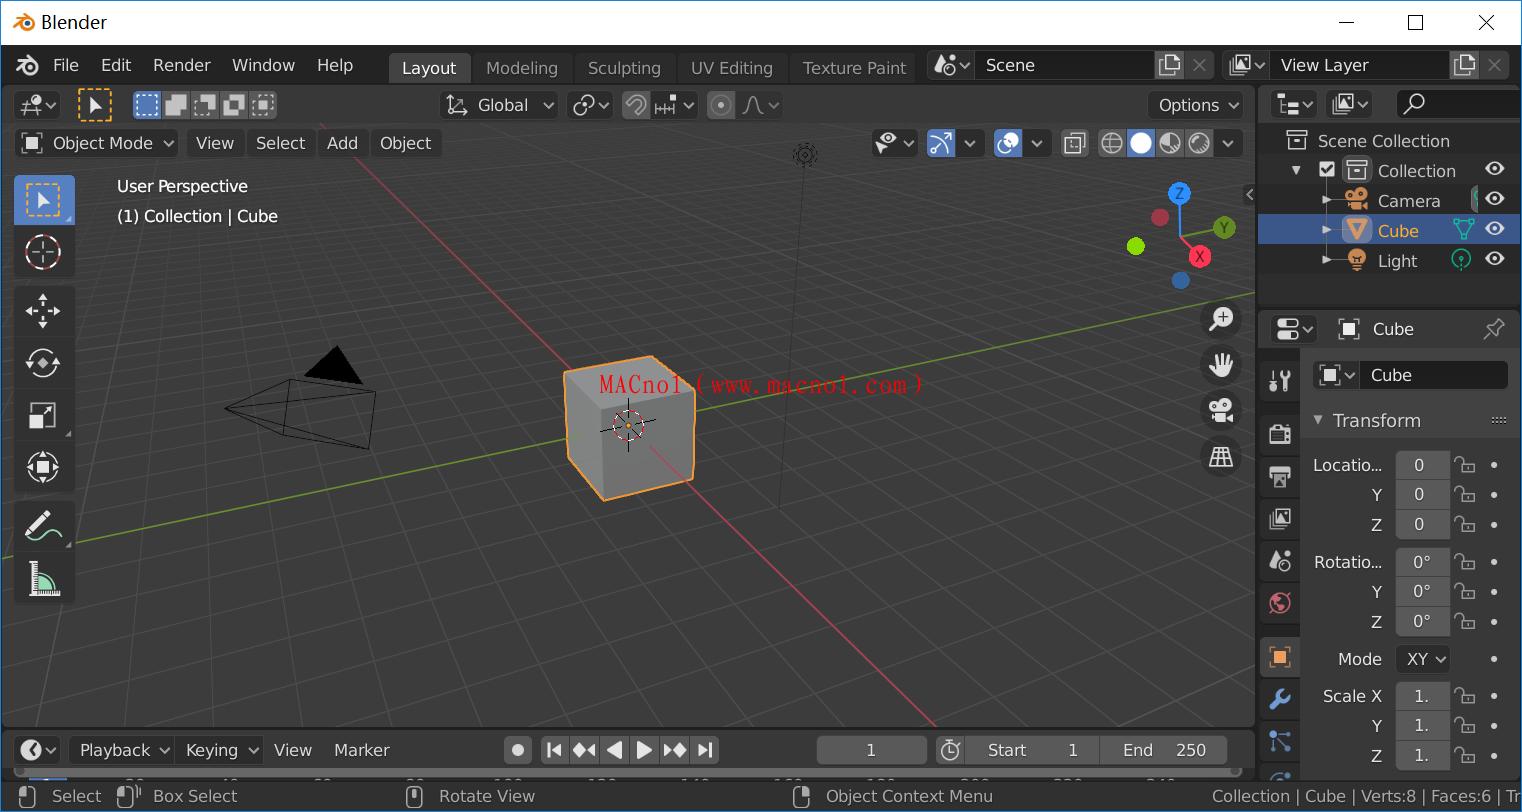 3D制作软件 Blender 3D 破解版 v2.83.4 绿色破解版(免注册码)